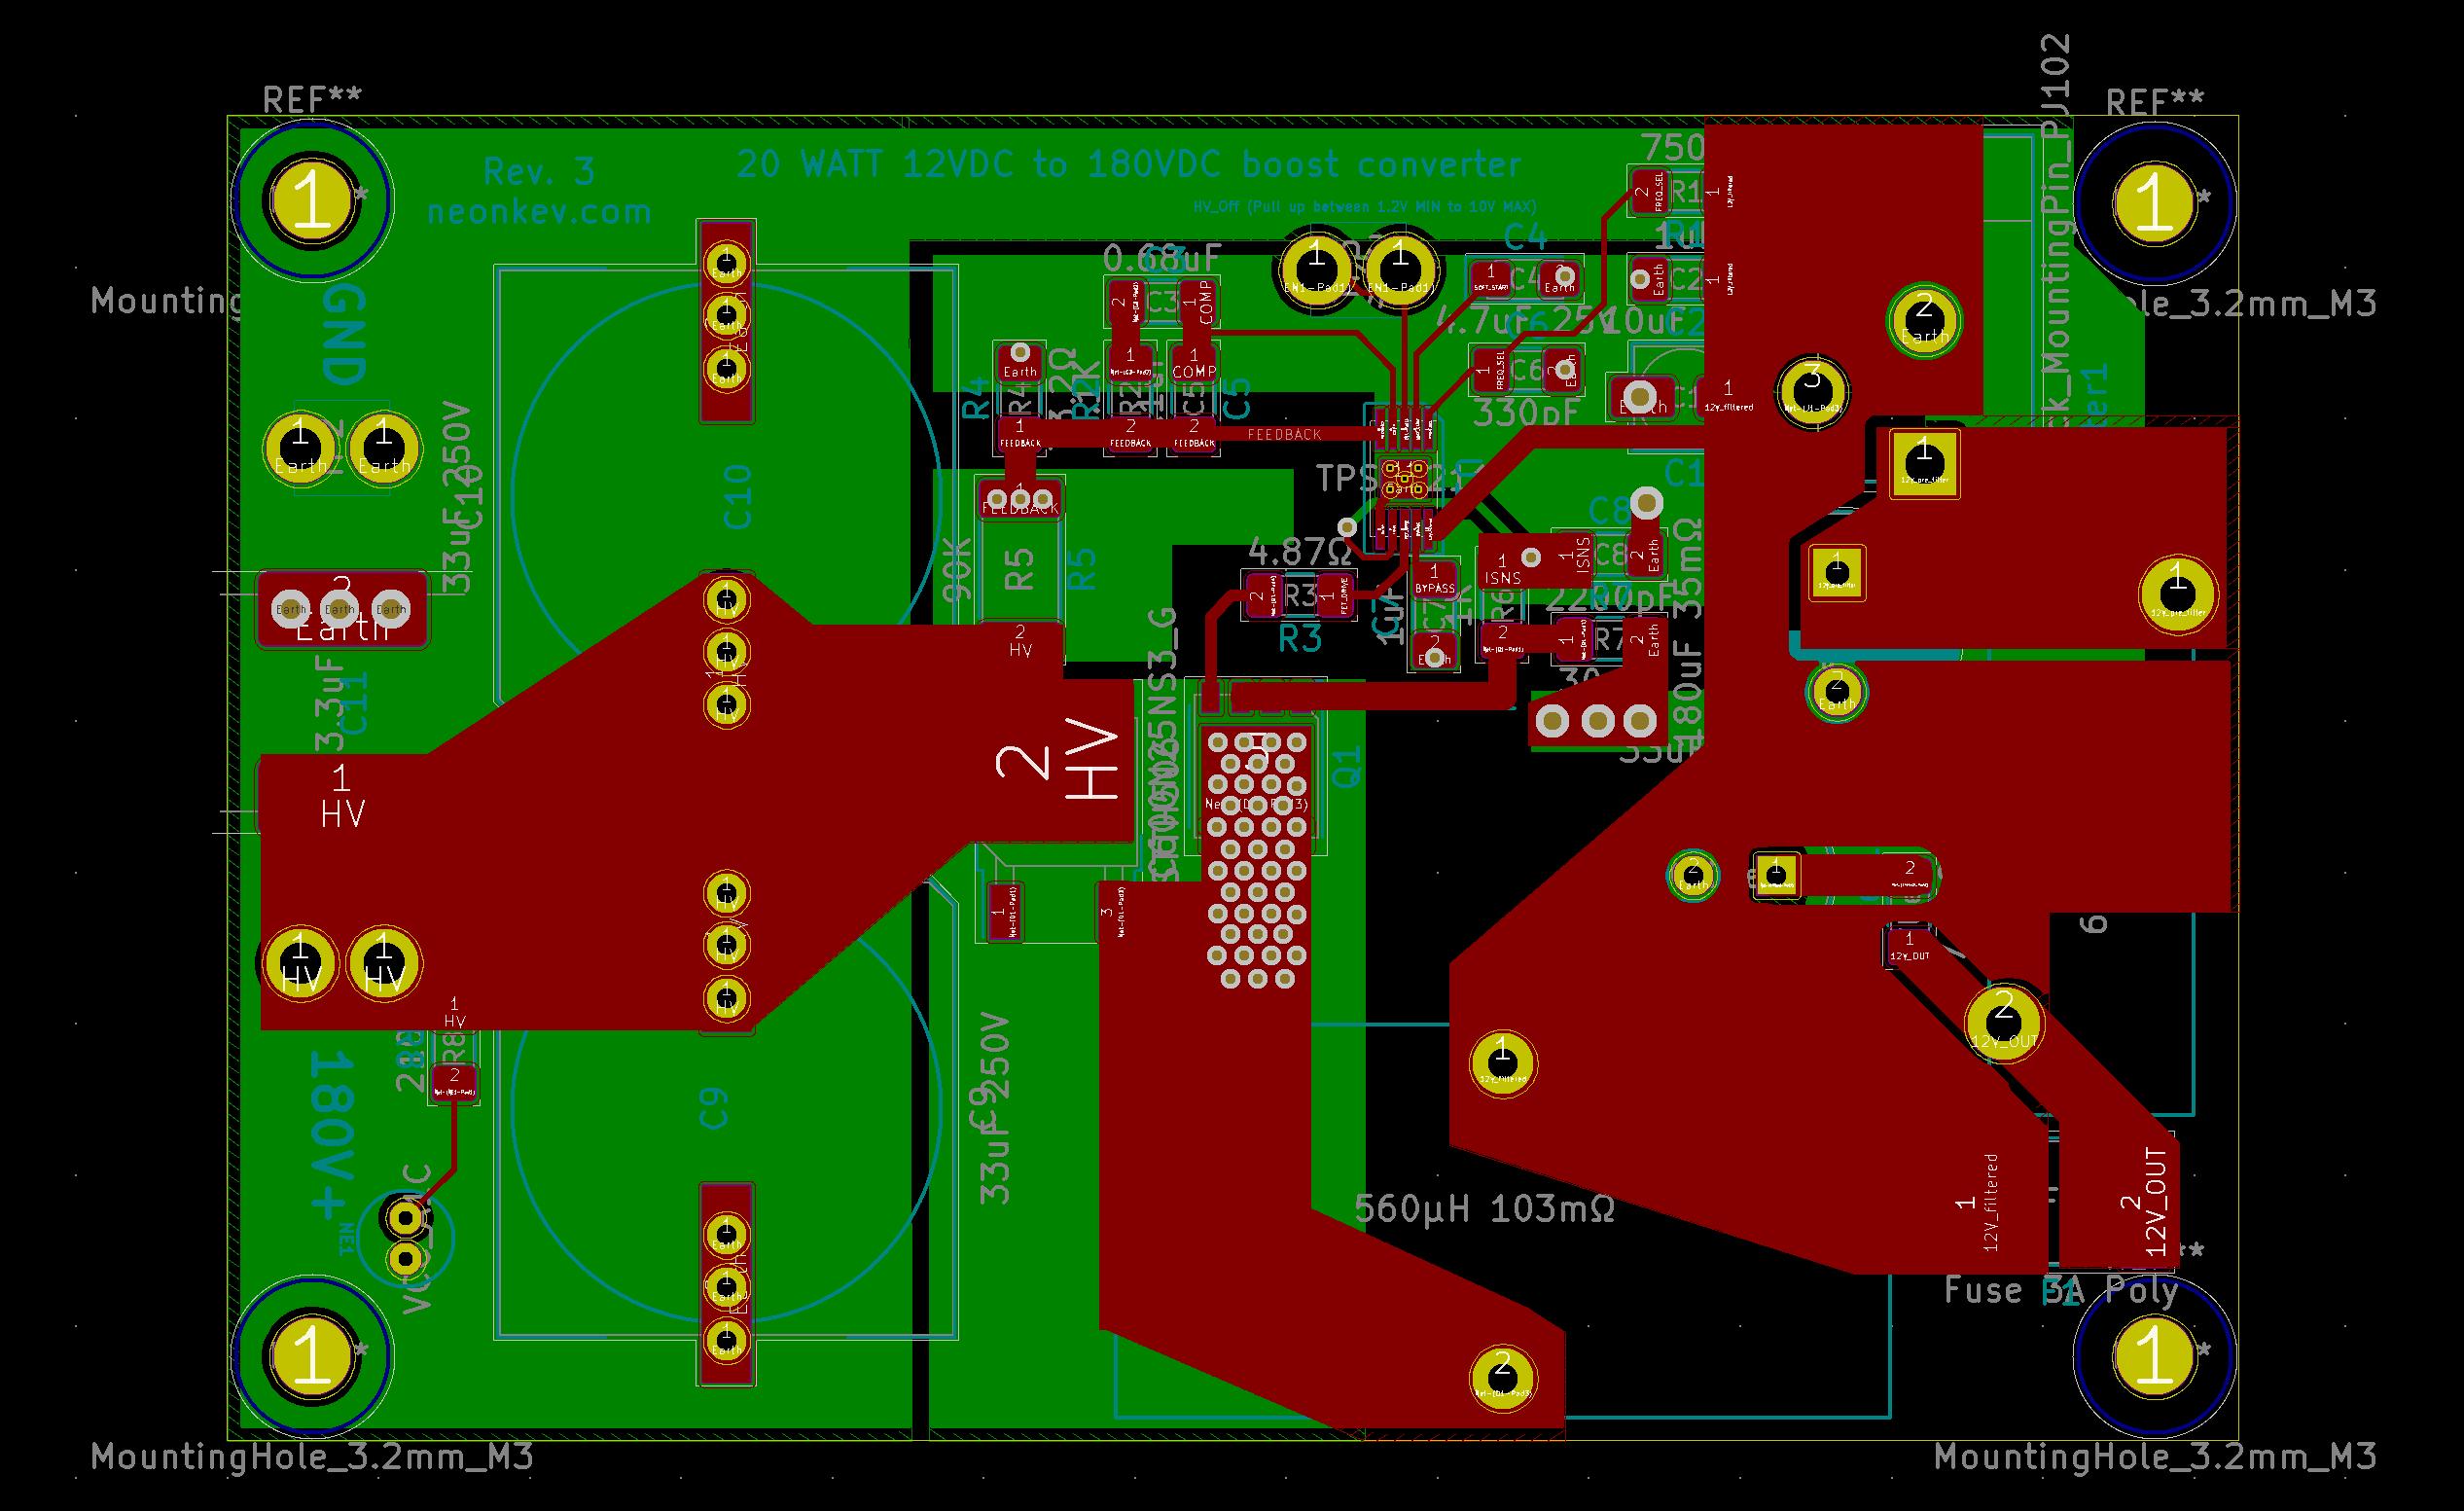 Project: 20 watt high voltage boost converter – Kevin